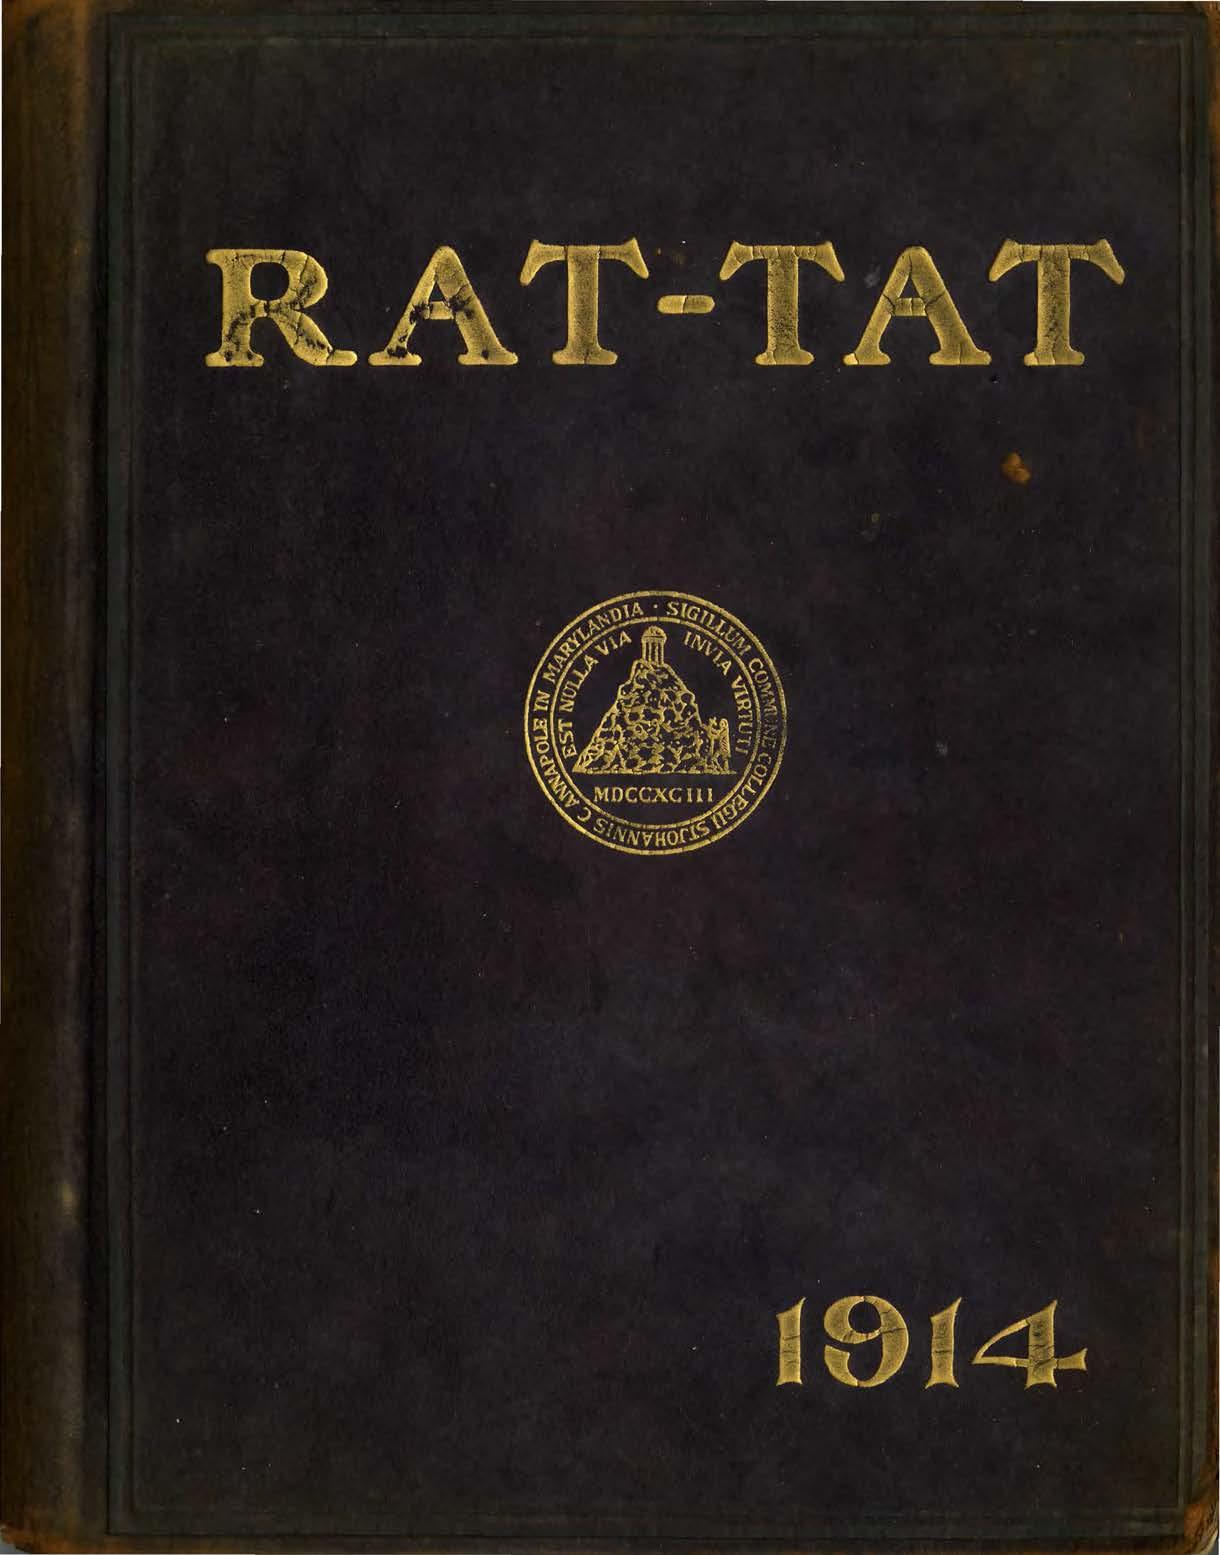 Rat-Tat 1914